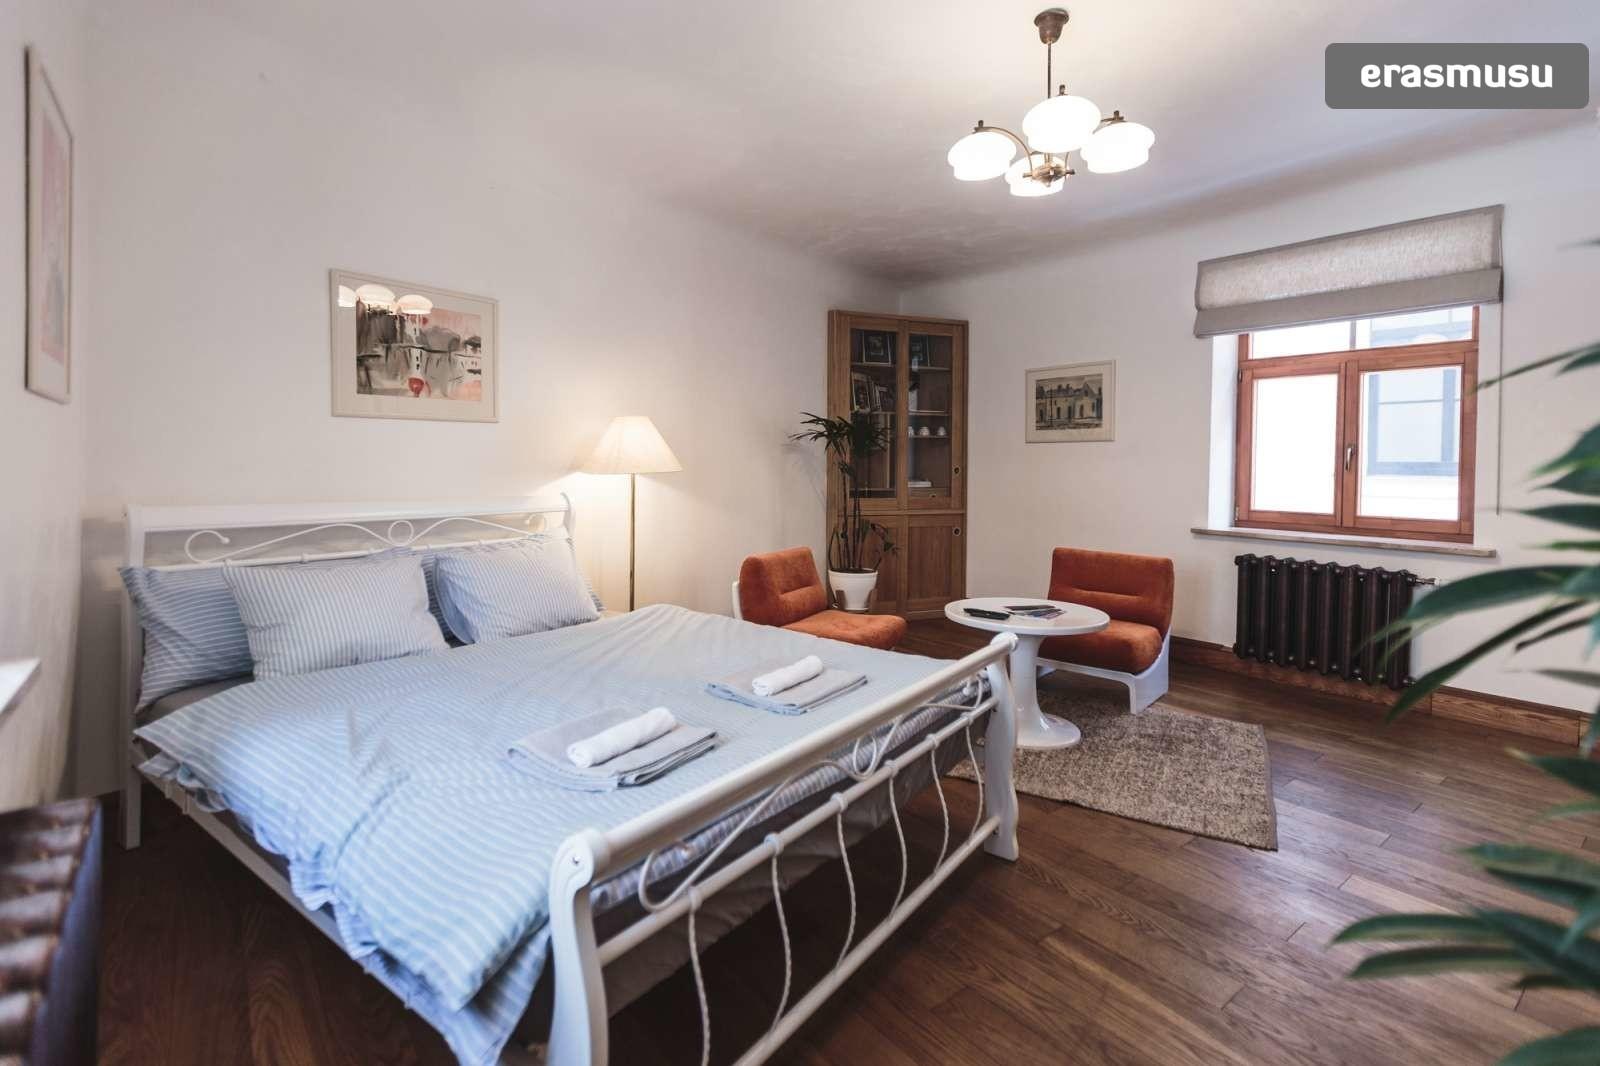 stylish-studio-apartment-rent-vecriga-dfc43bcc8fdfcc2b06c9e708d9